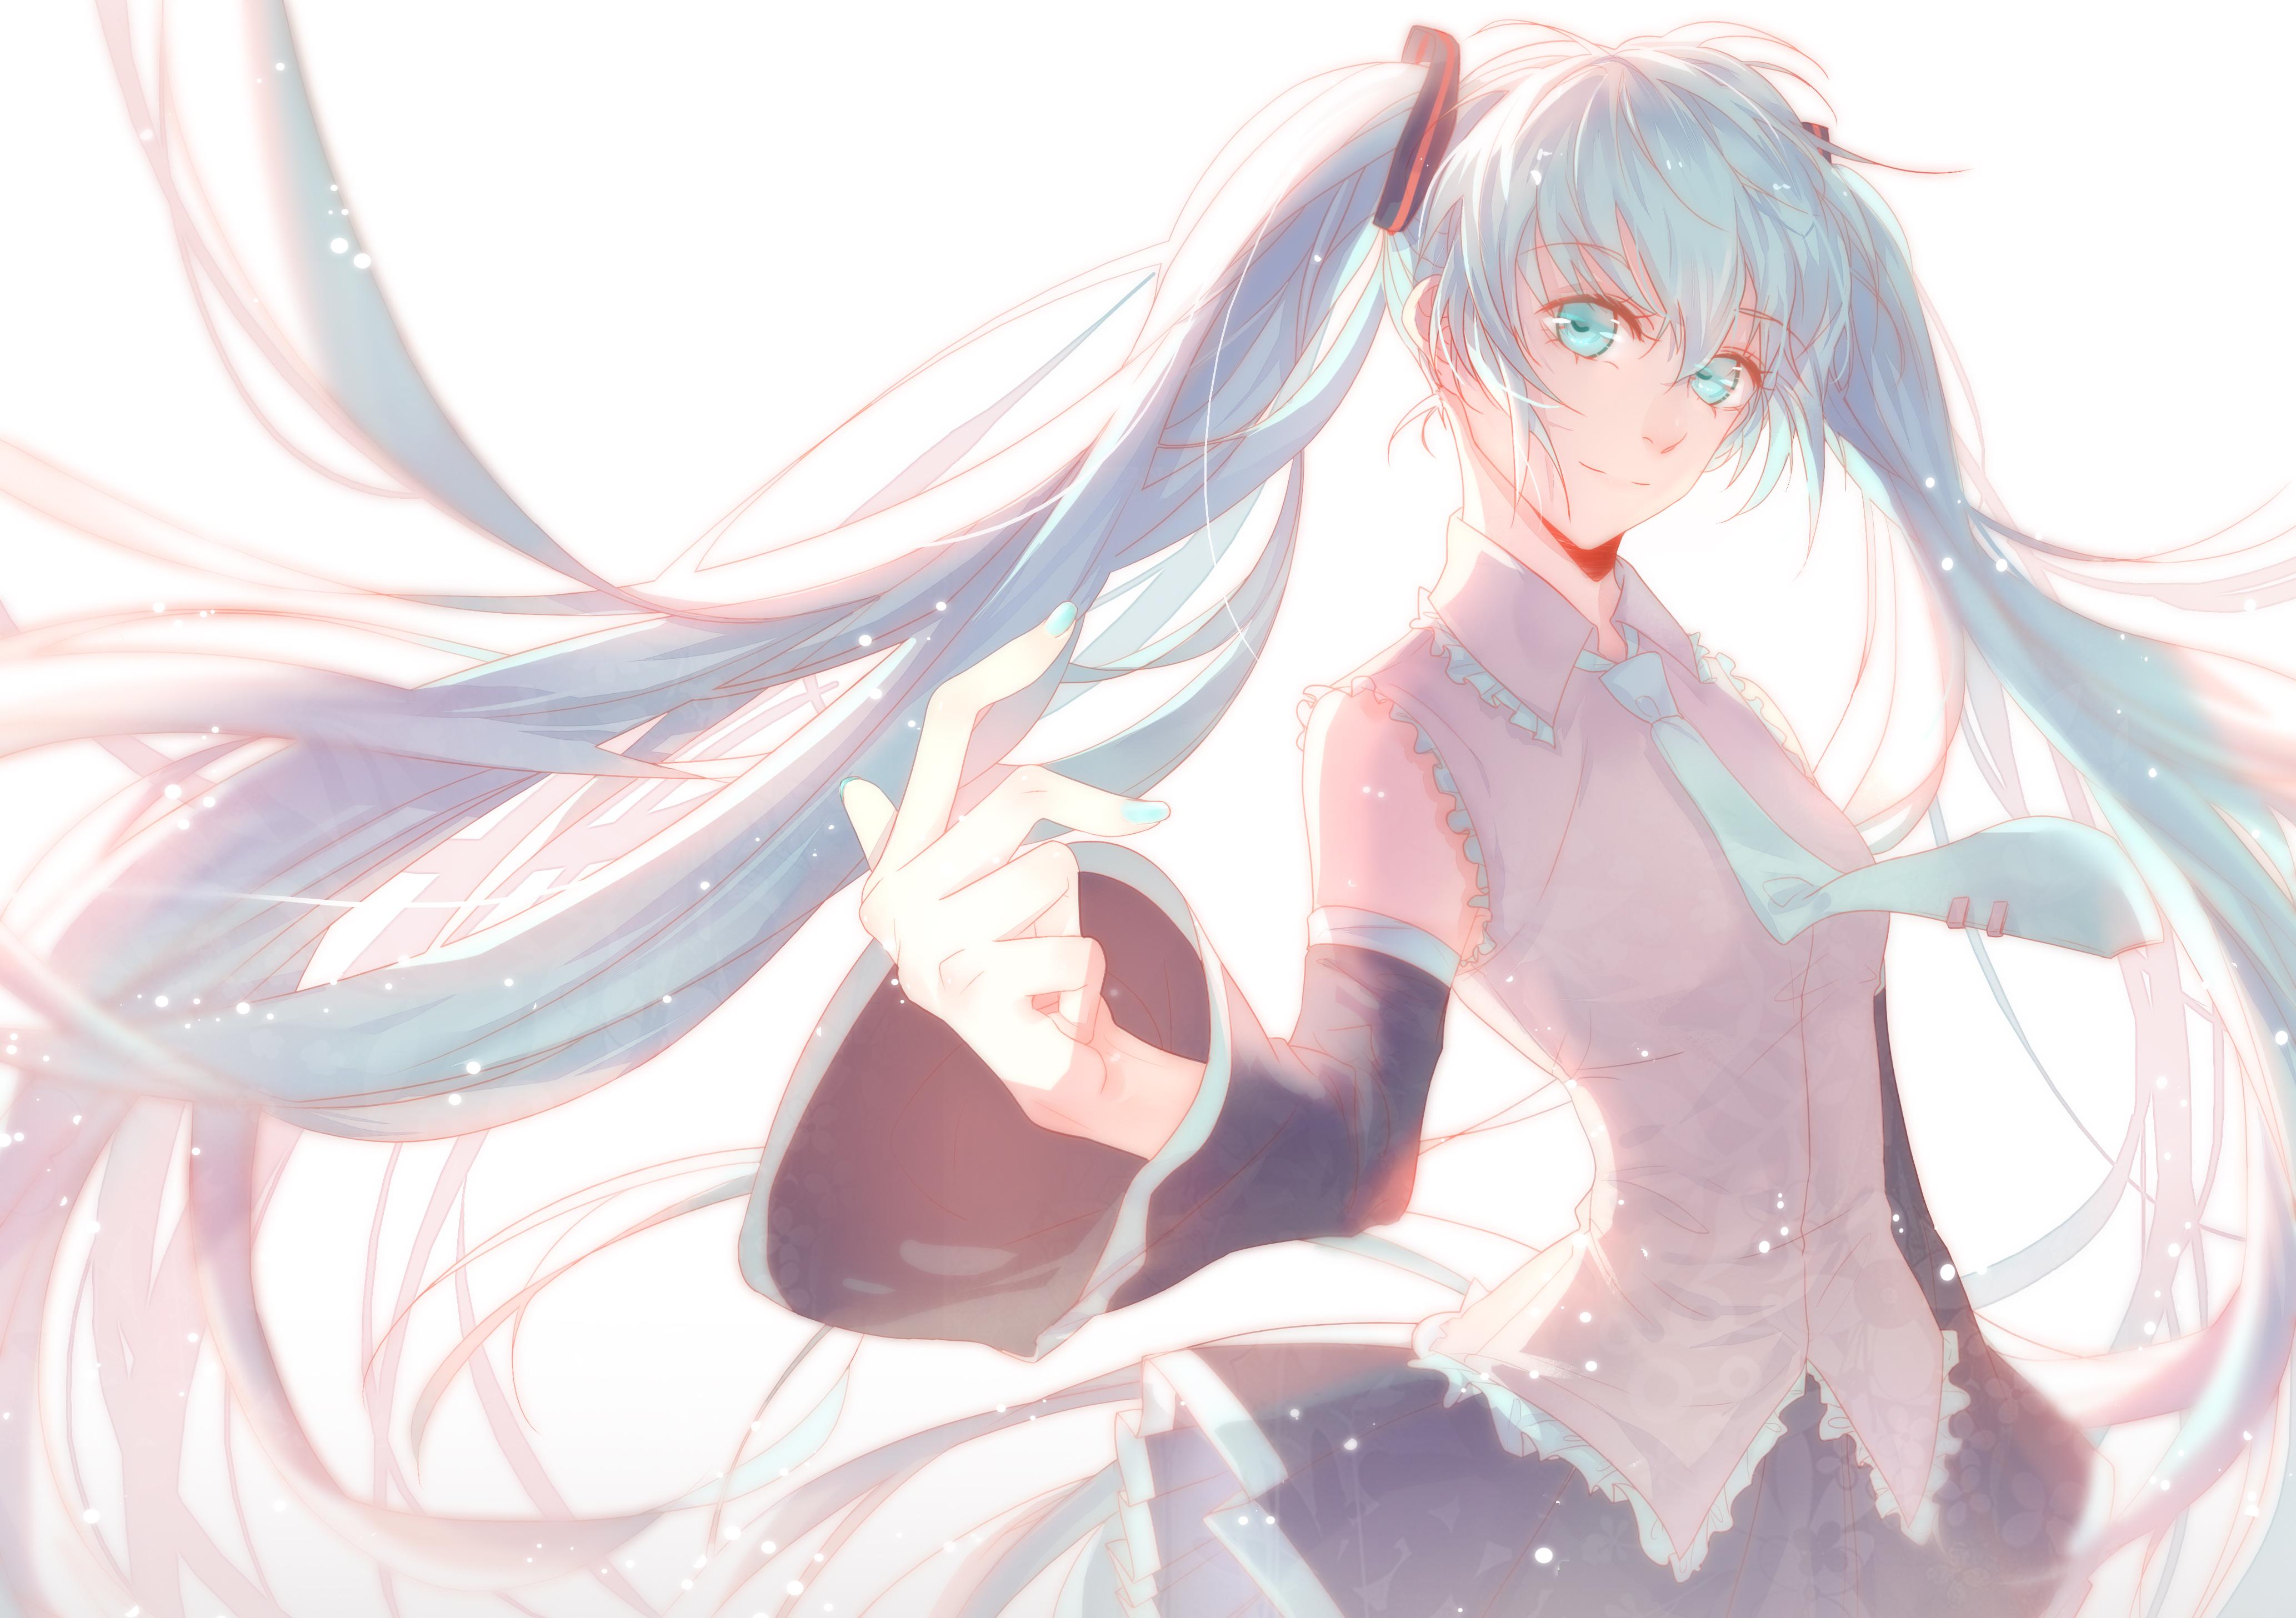 Vocaloid 4k Ultra HD Wallpaper | Background Image